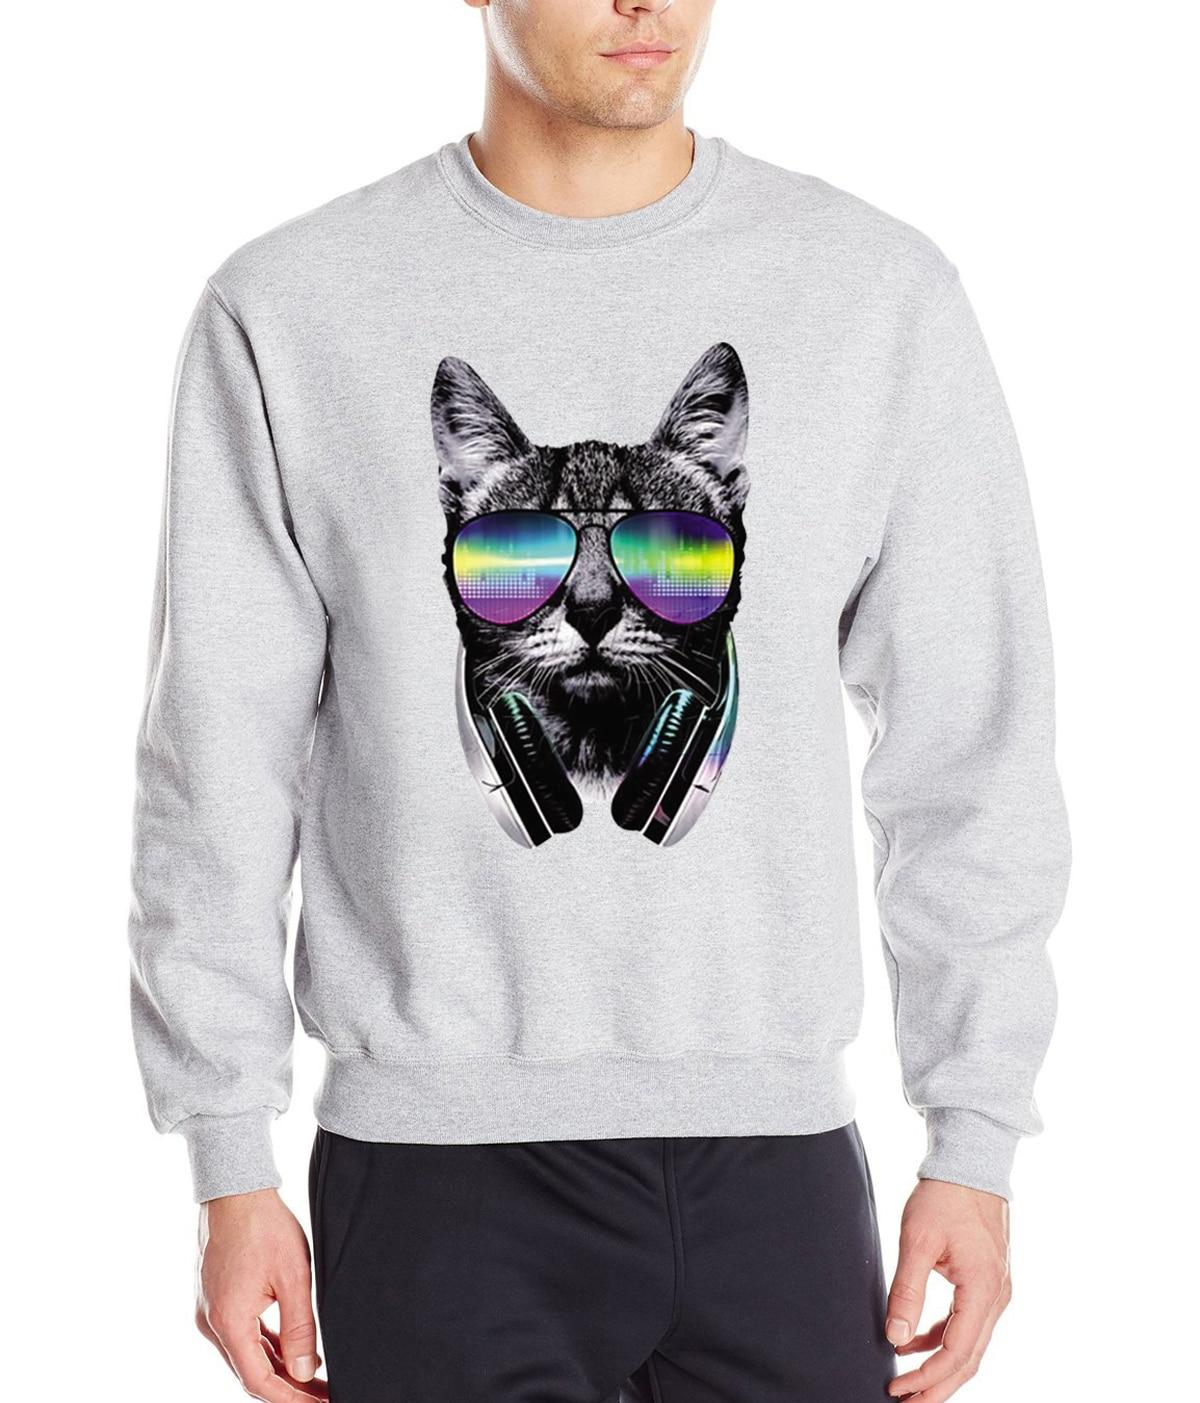 Animal Music DJ Cat Men Hoodies 2019 Spring Winter Fleece 3D Printed Anime Sweatshirt Funny Creative Hoodie Casual Tracksuit Men